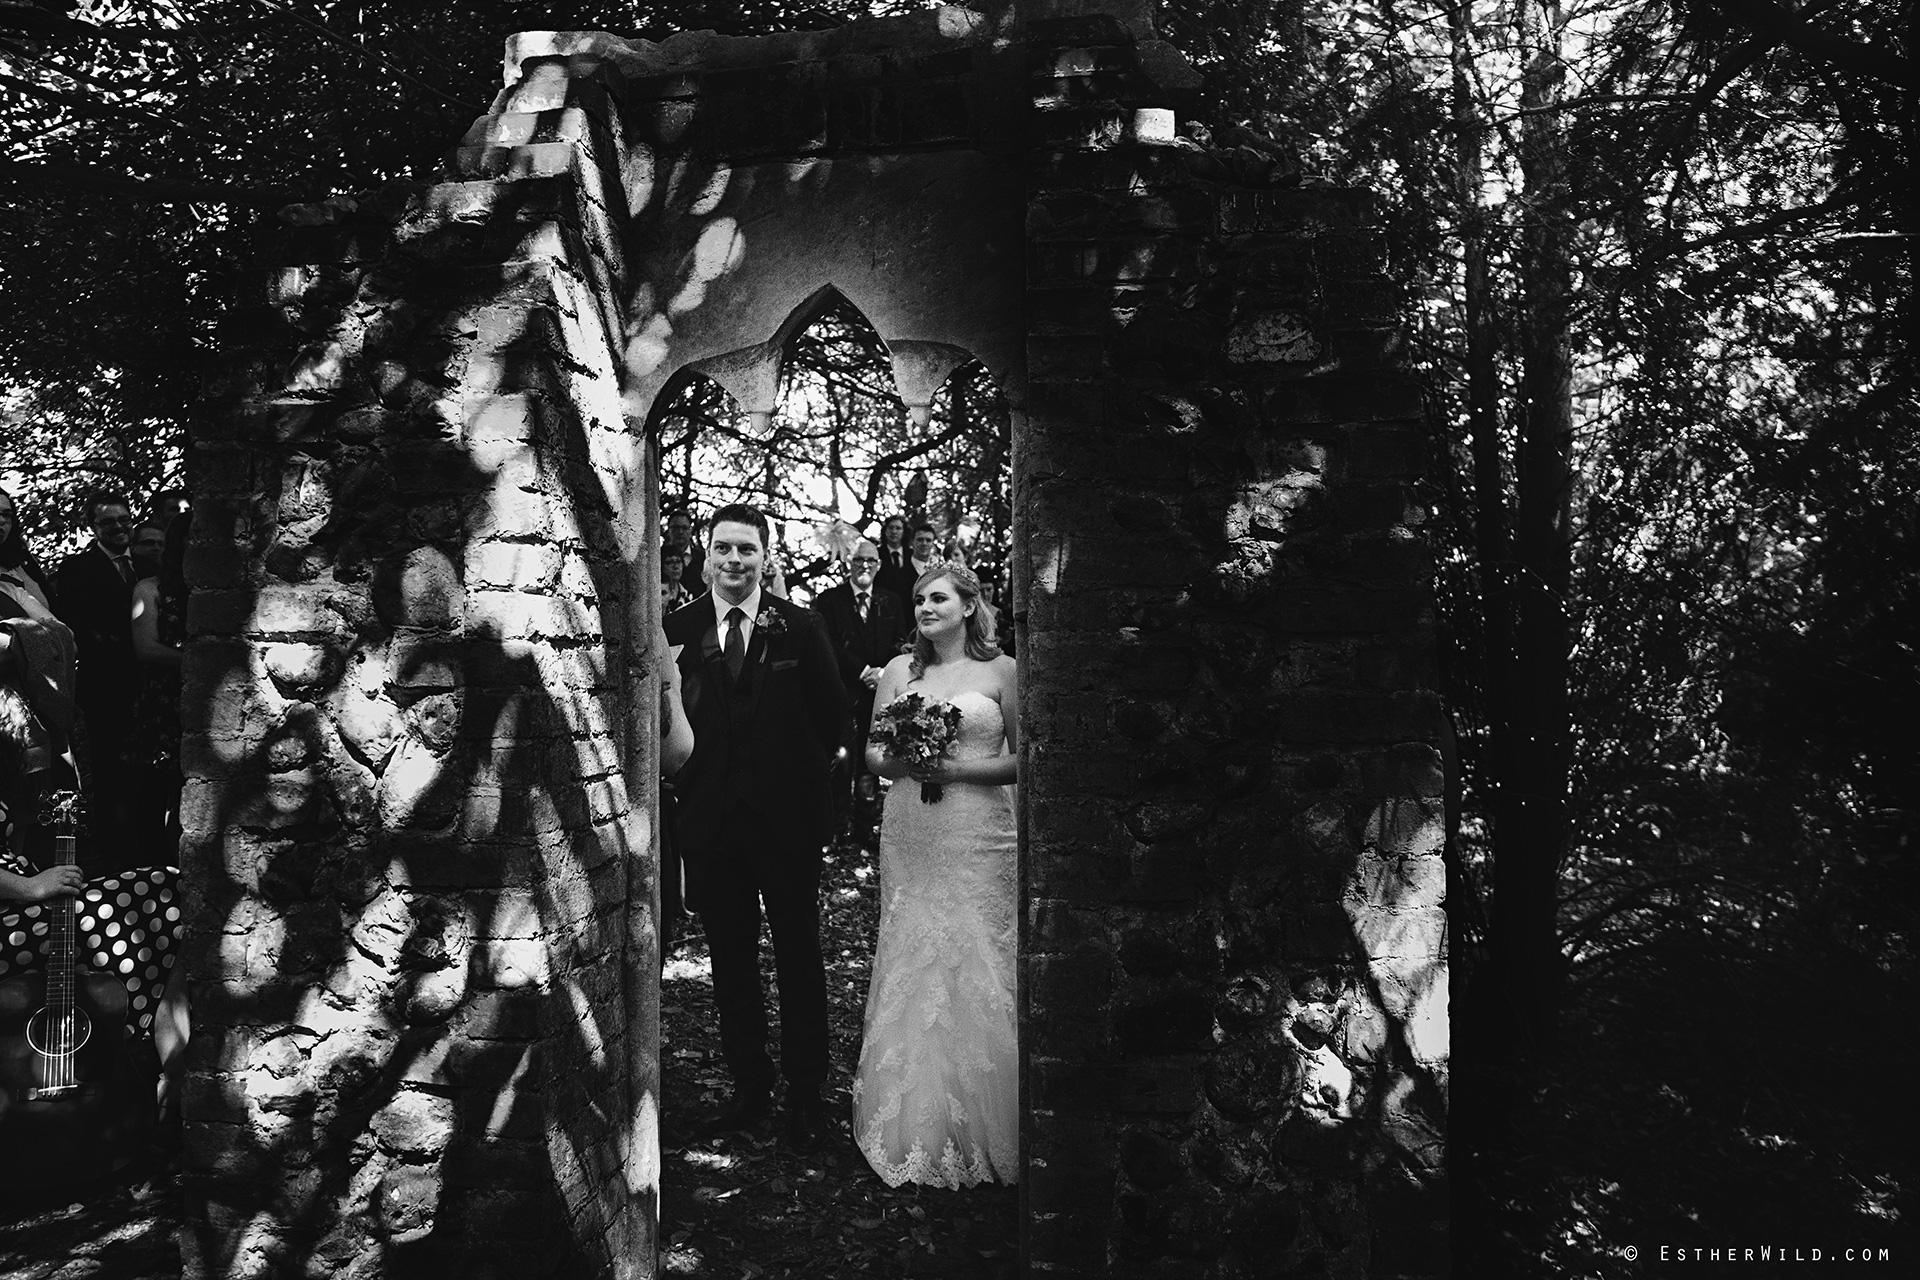 Norfolk_Wedding_Photographer_Mannington_Hall_Country_Esther_Wild_0985-1.jpg